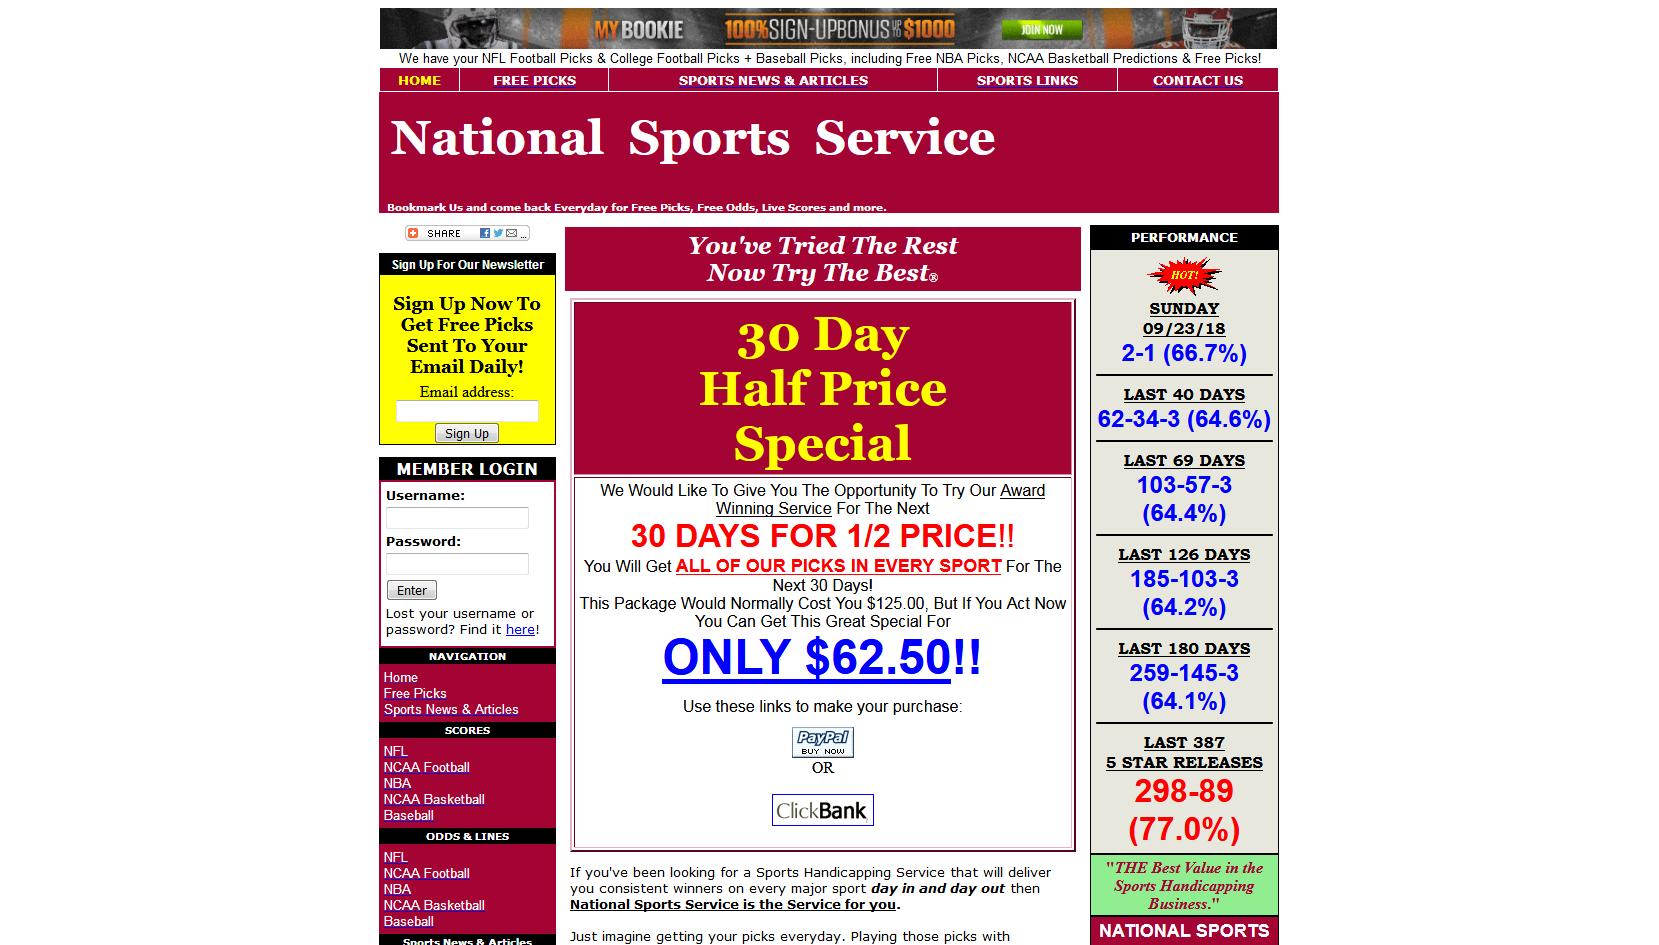 National Sports Service